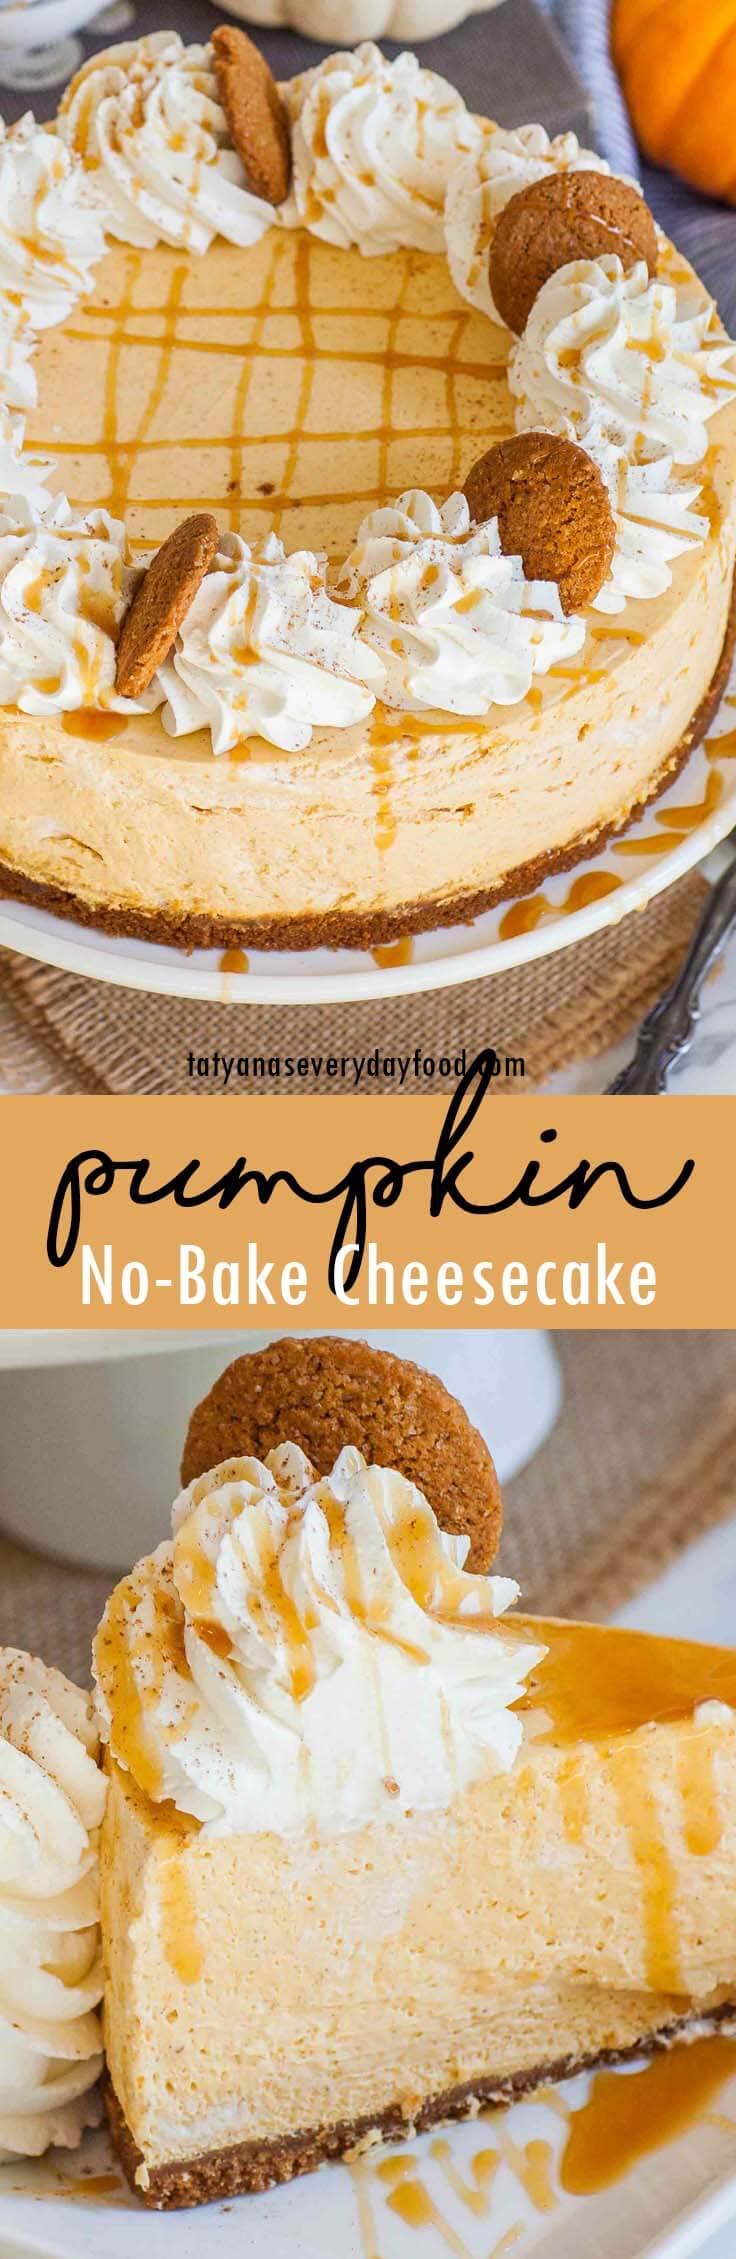 No-Bake Pumpkin Cheesecake video recipe